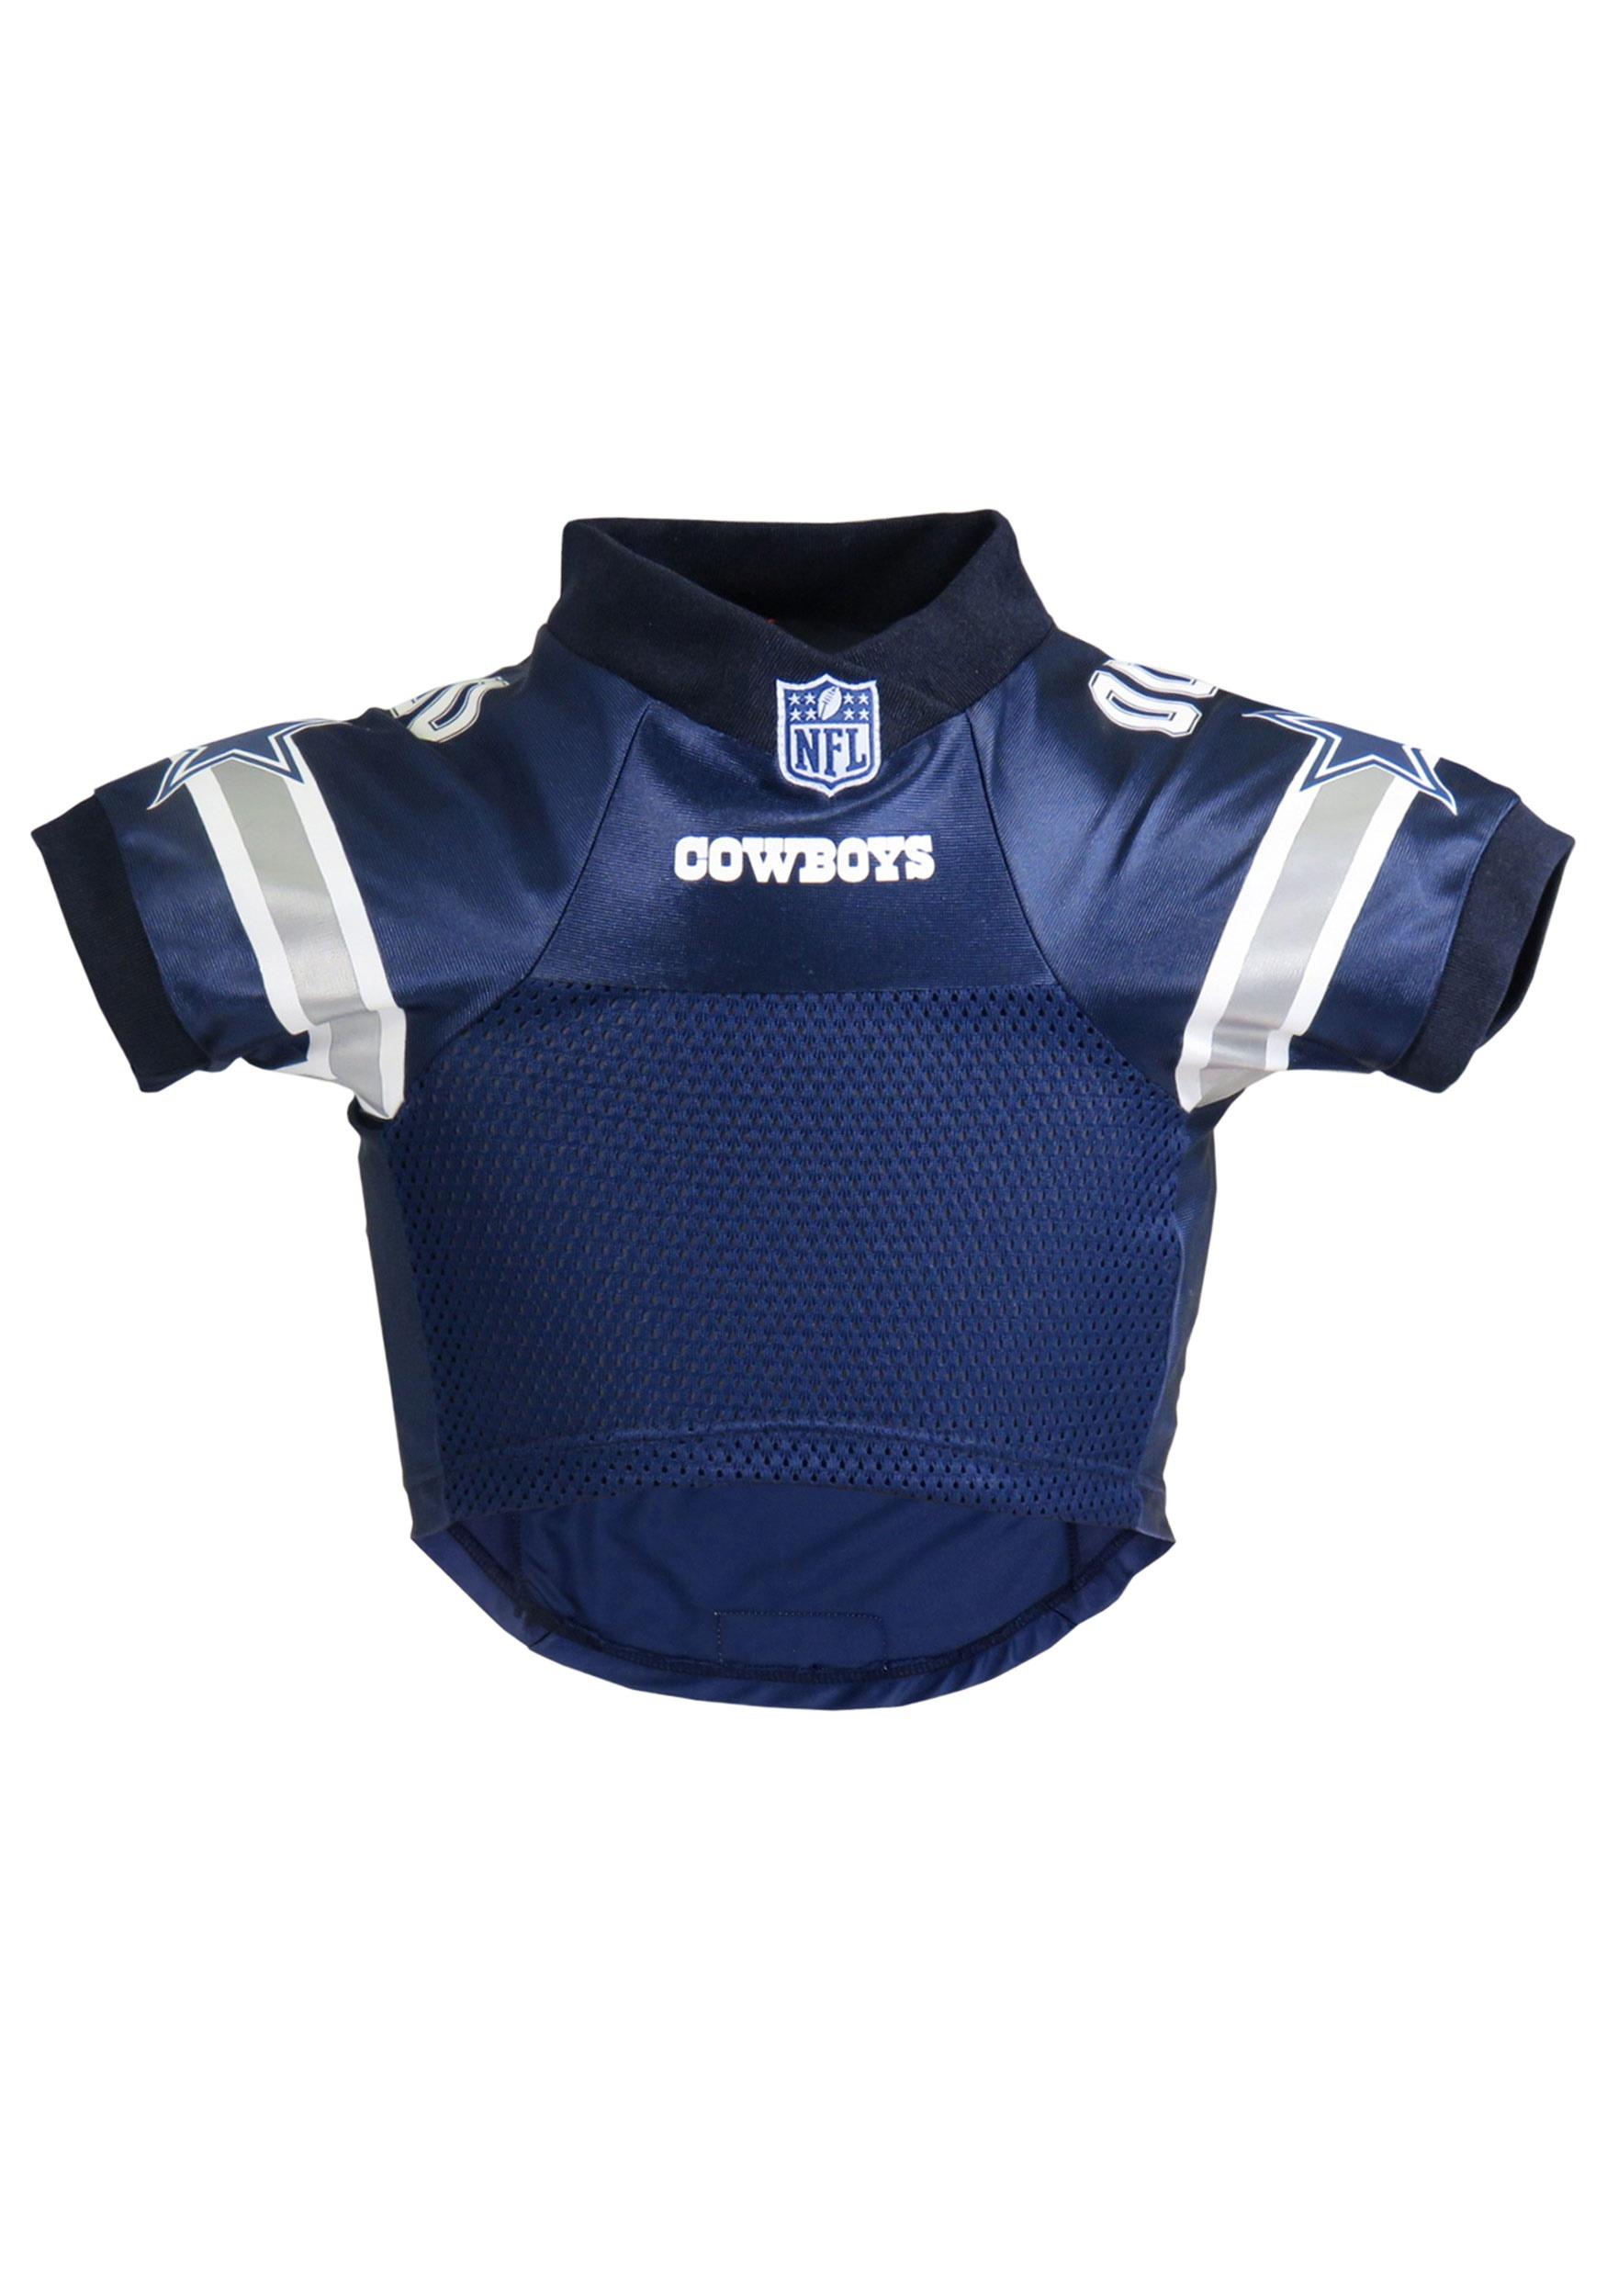 NFL Dallas Cowboys Premium Jersey for Pets a143e08f5